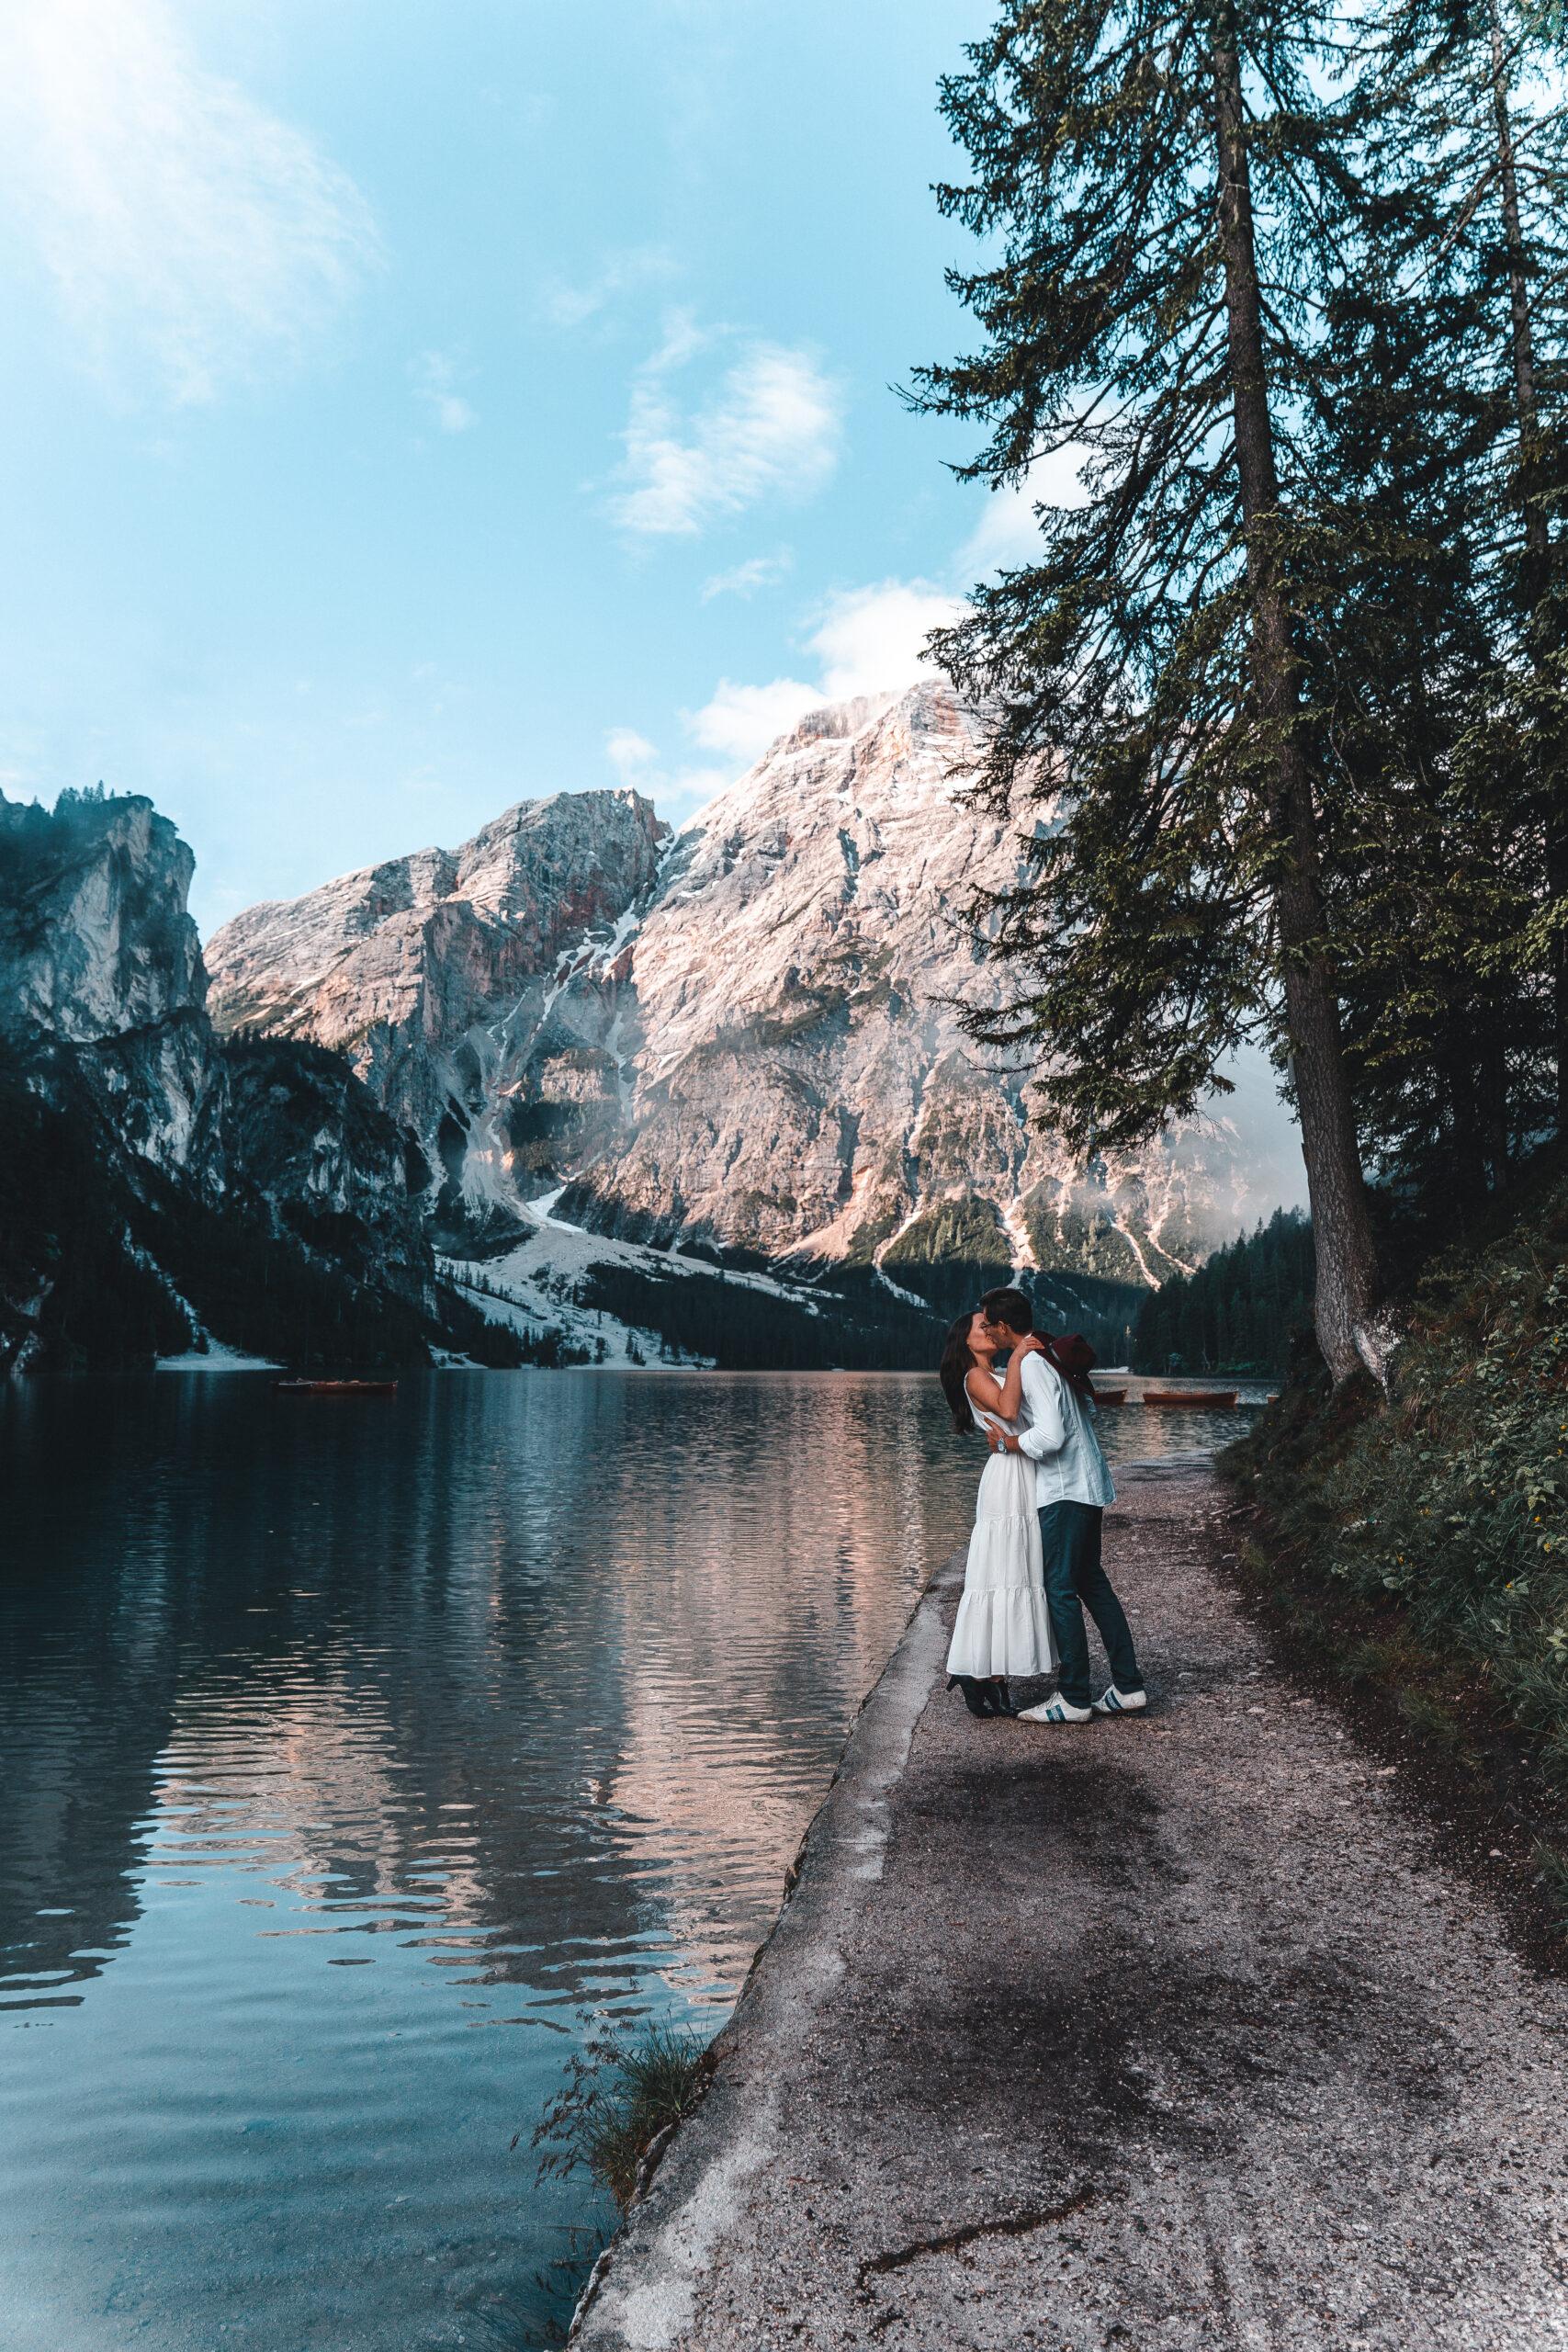 Pragser Wildsee |Complete Guide